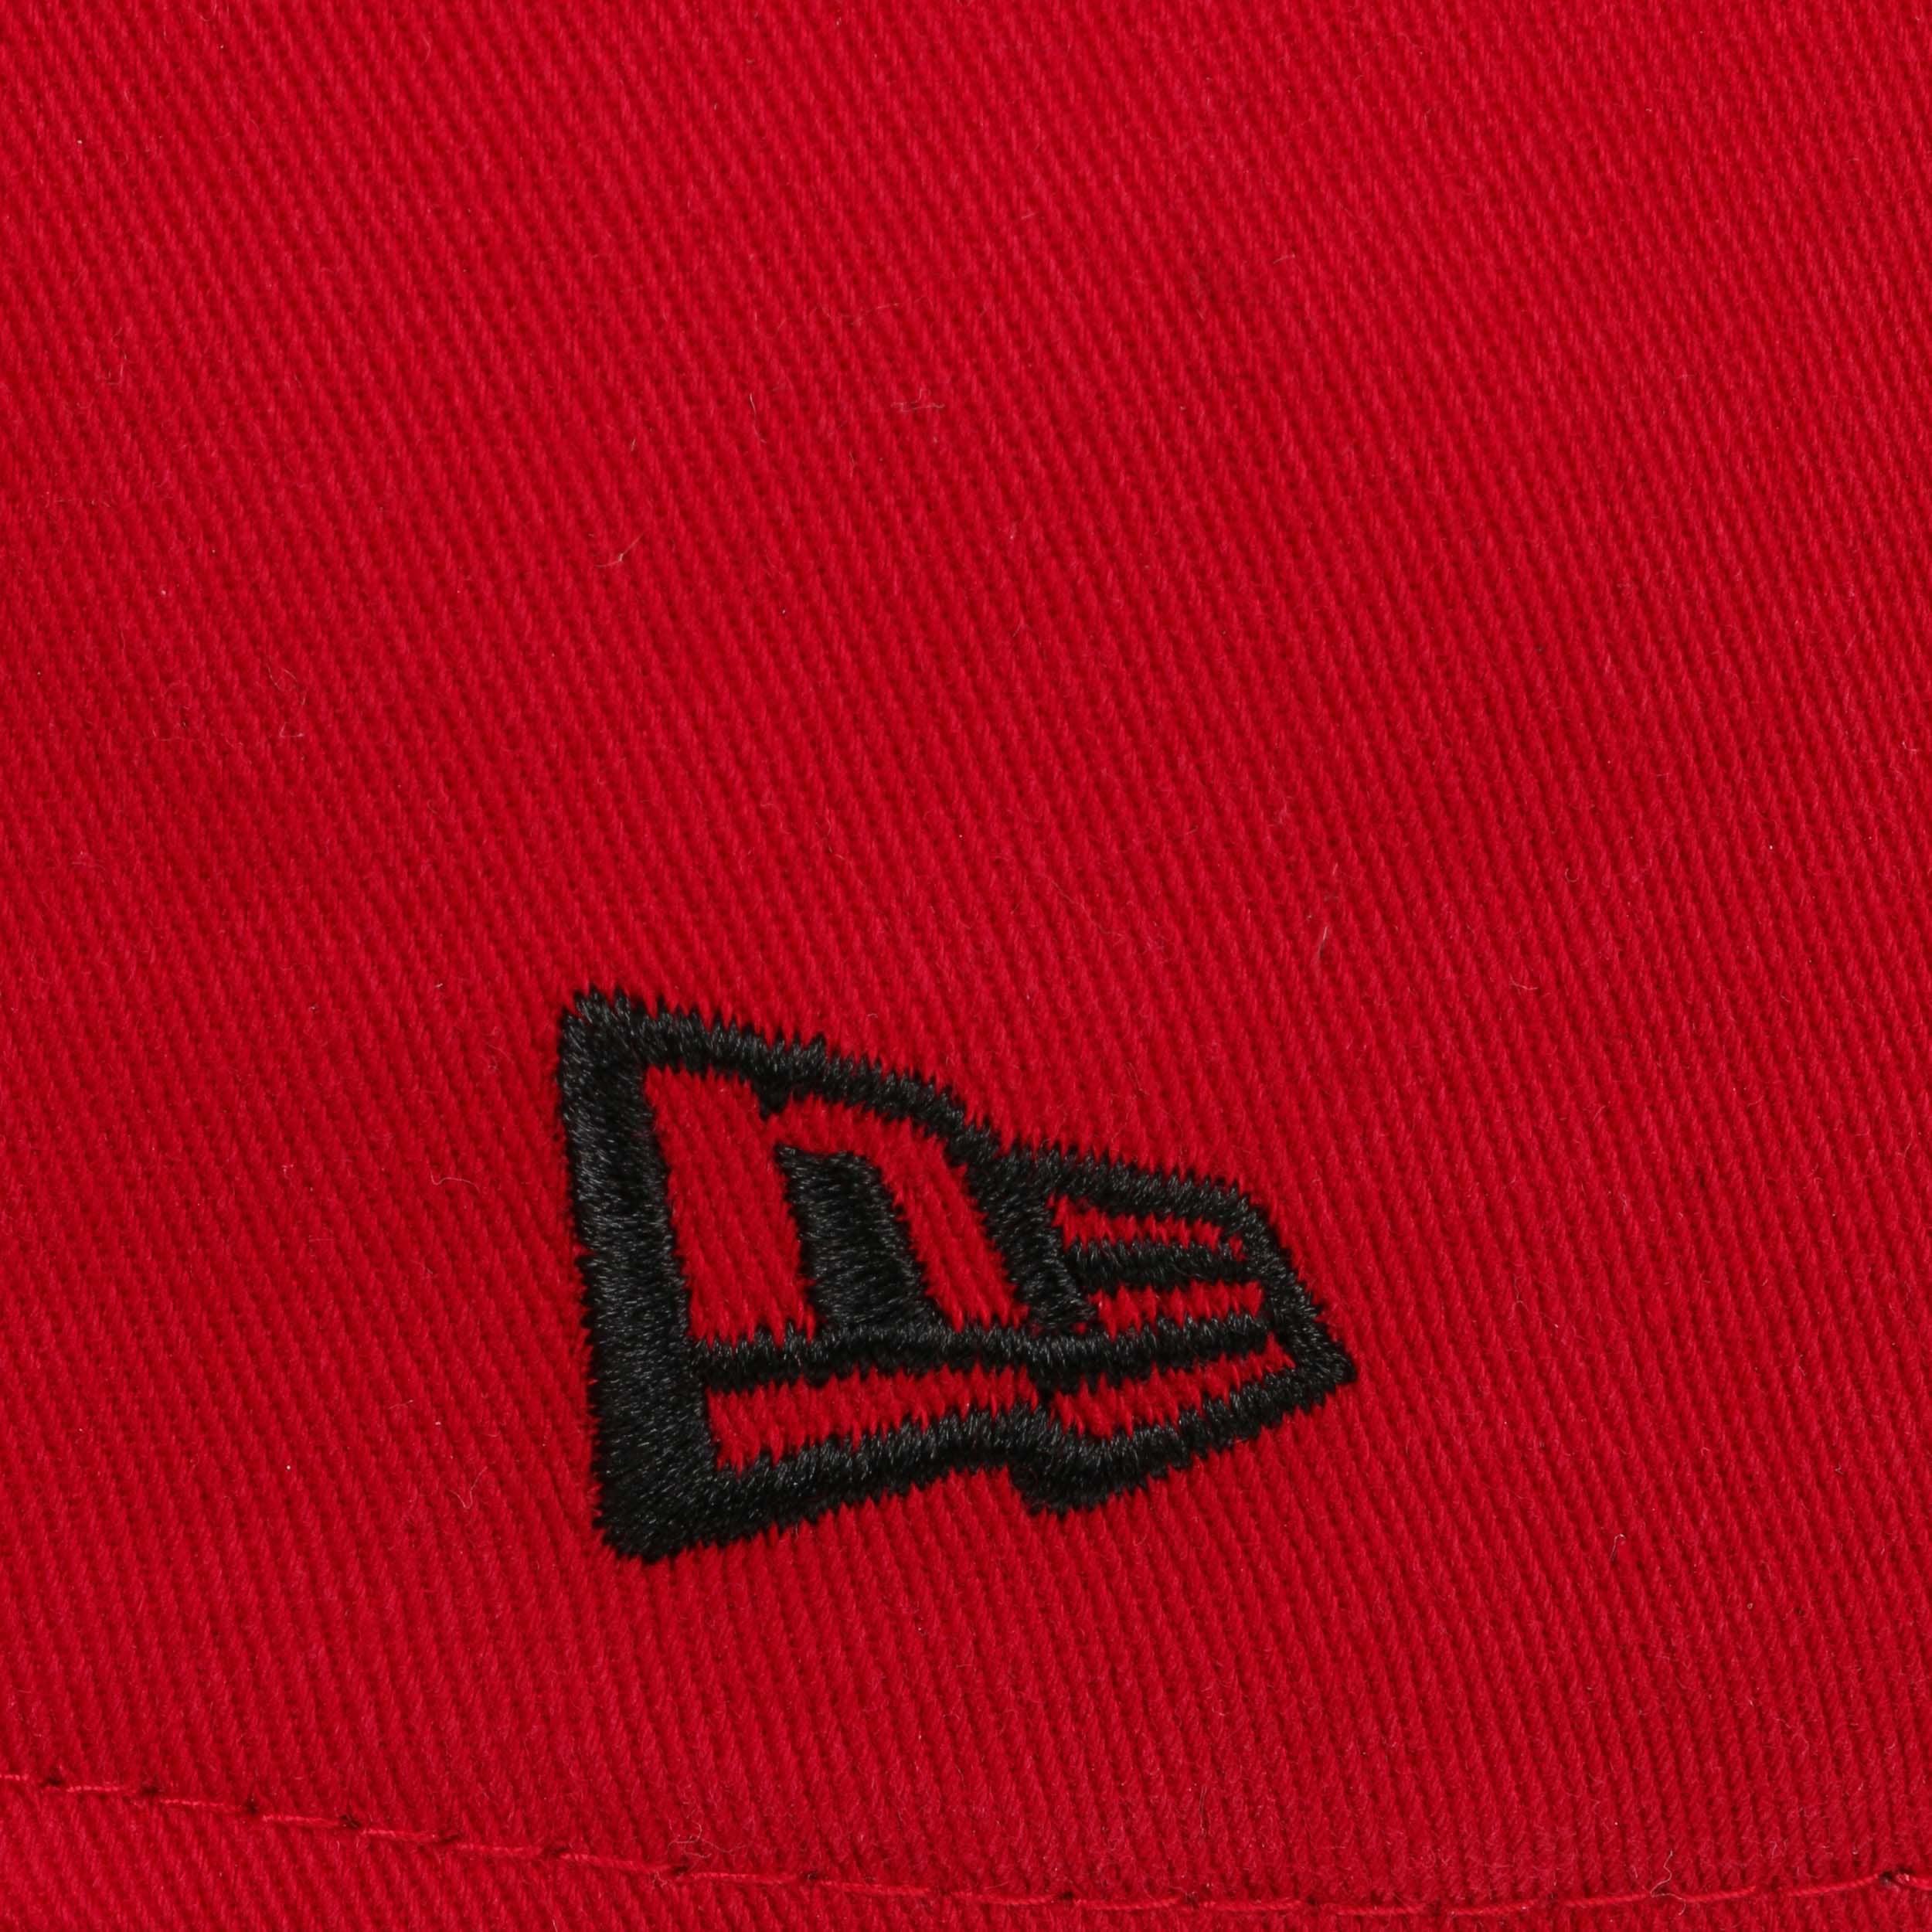 ... 59Fifty Chainstitch Bulls Cap by New Era - red 5 ... 4f017f540747